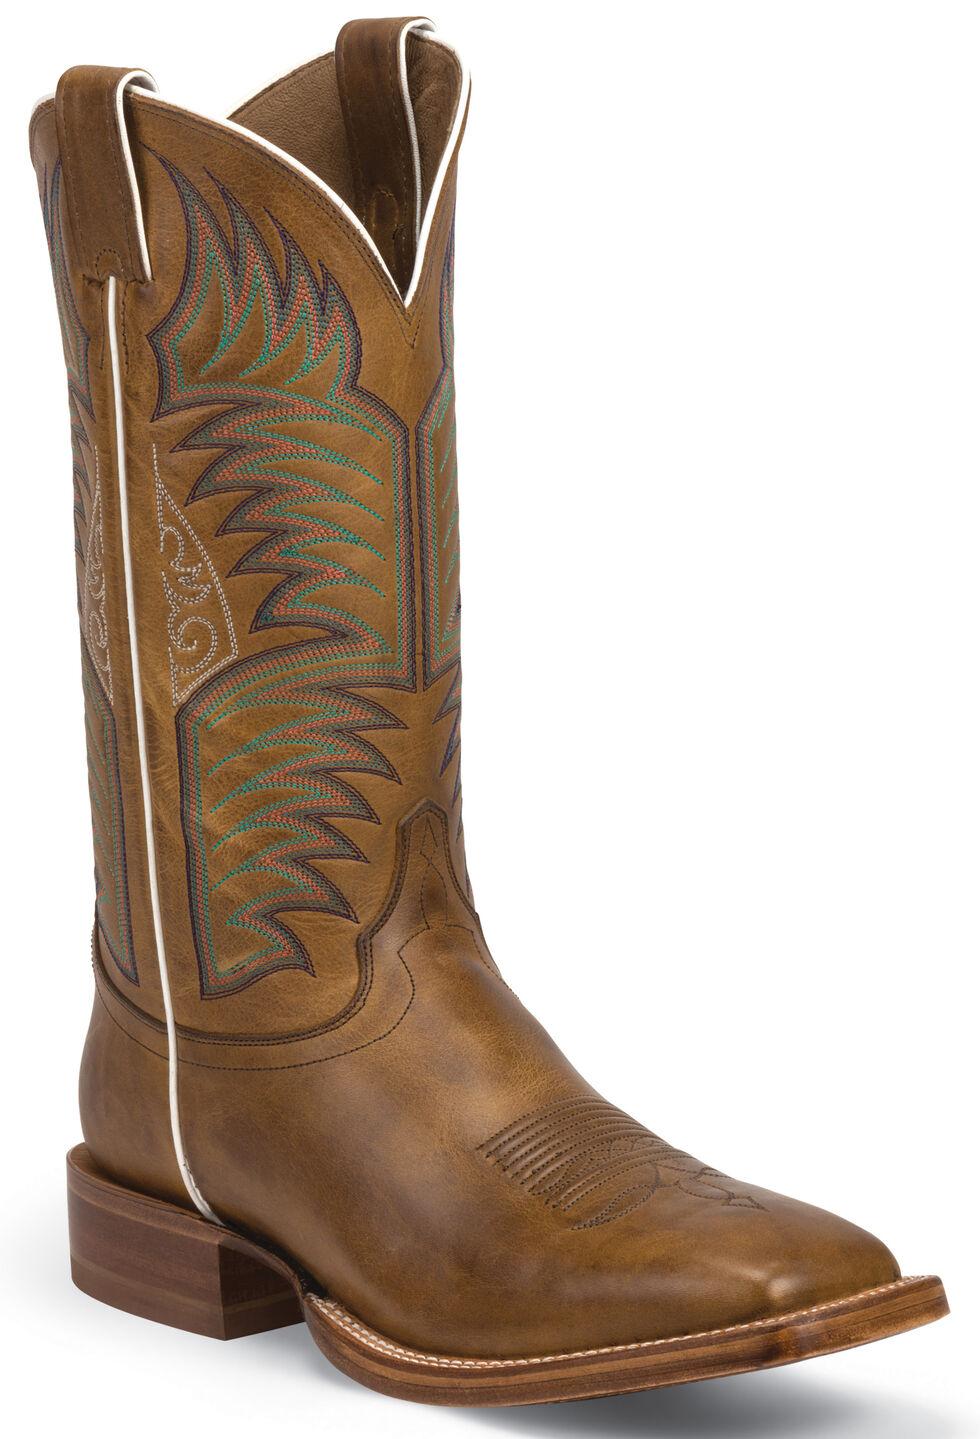 Justin Sierra Tan Stampede CPX Cowboy Boots - Square Toe , Tan, hi-res